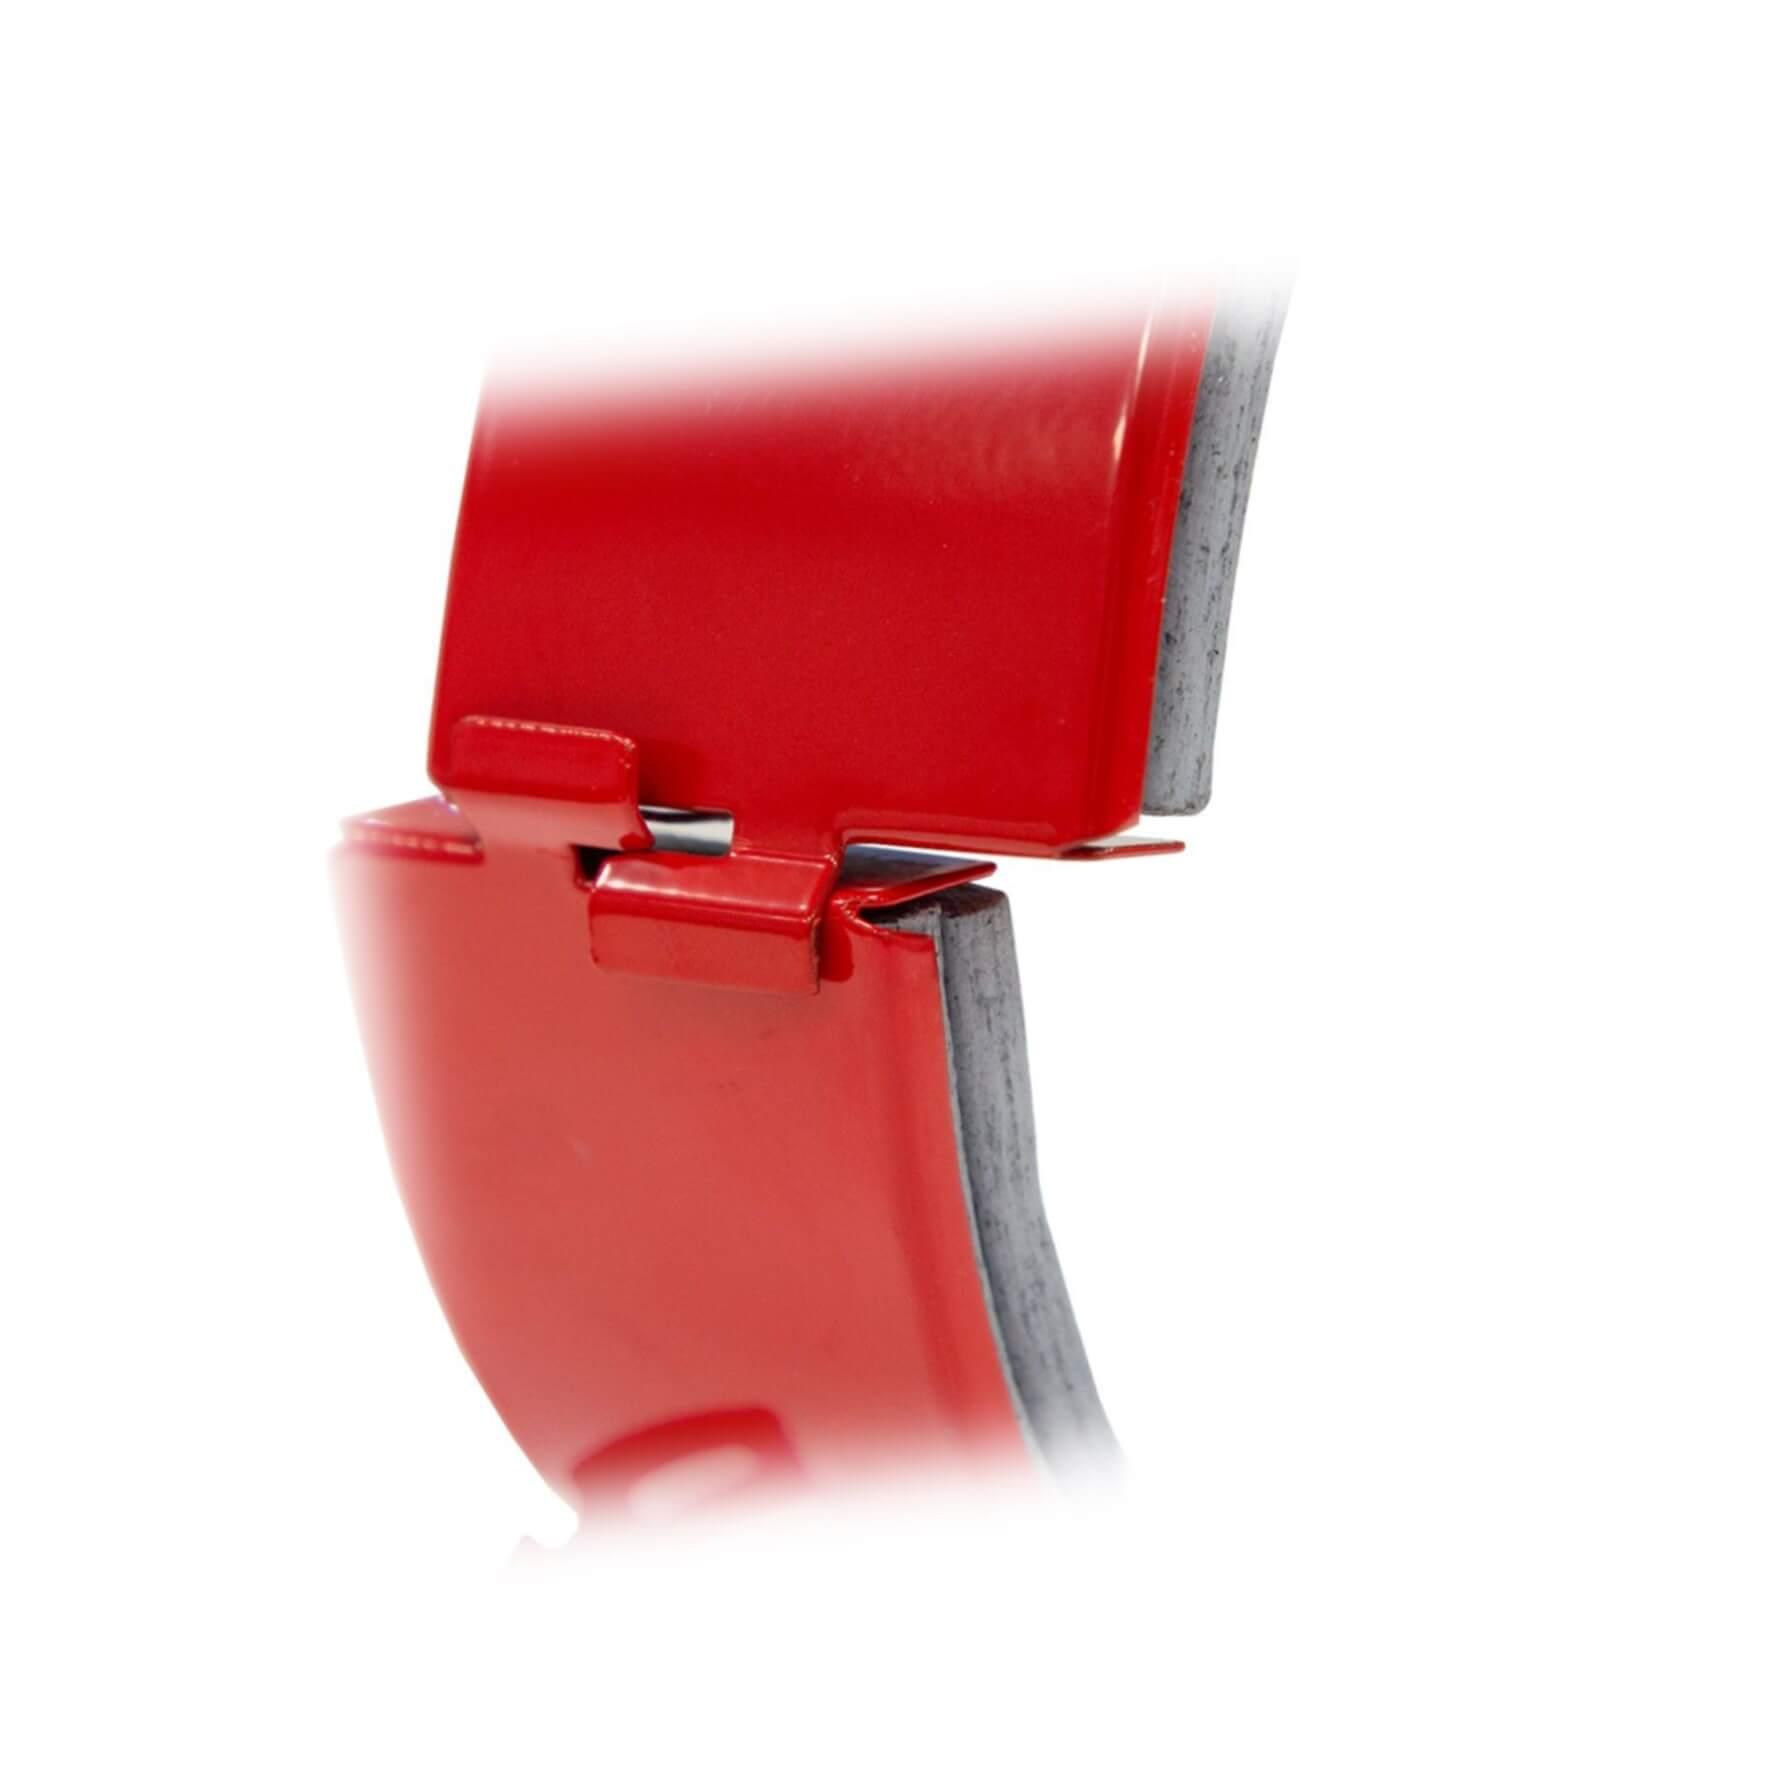 Astroflame AFPC110 Slide lock